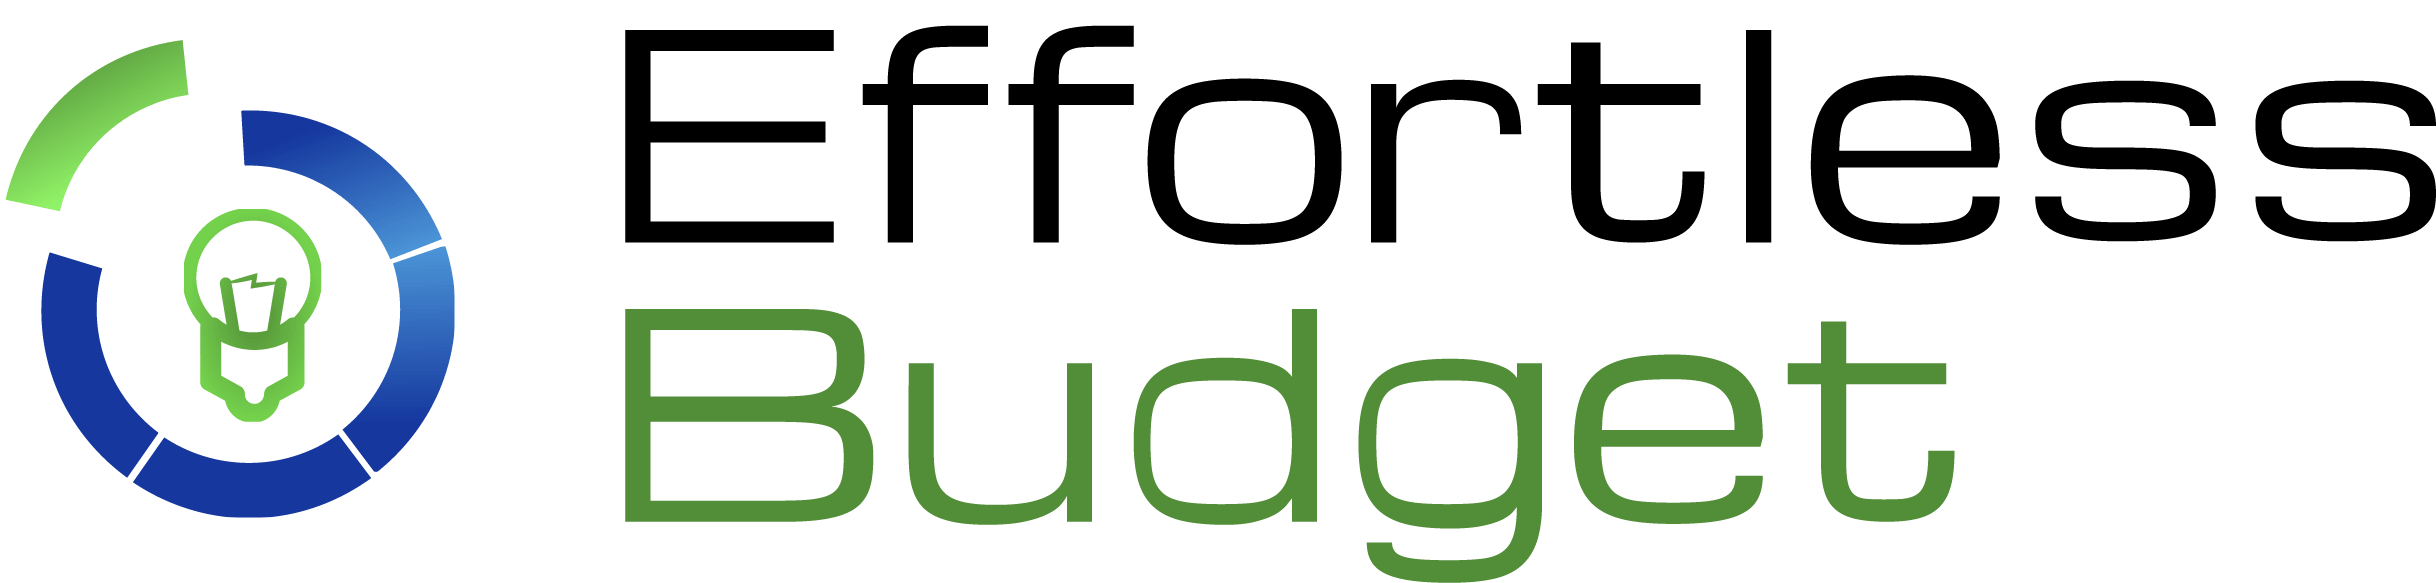 Law Firm Billing Software for Attorneys & Legal Practices | EffortlessBudget